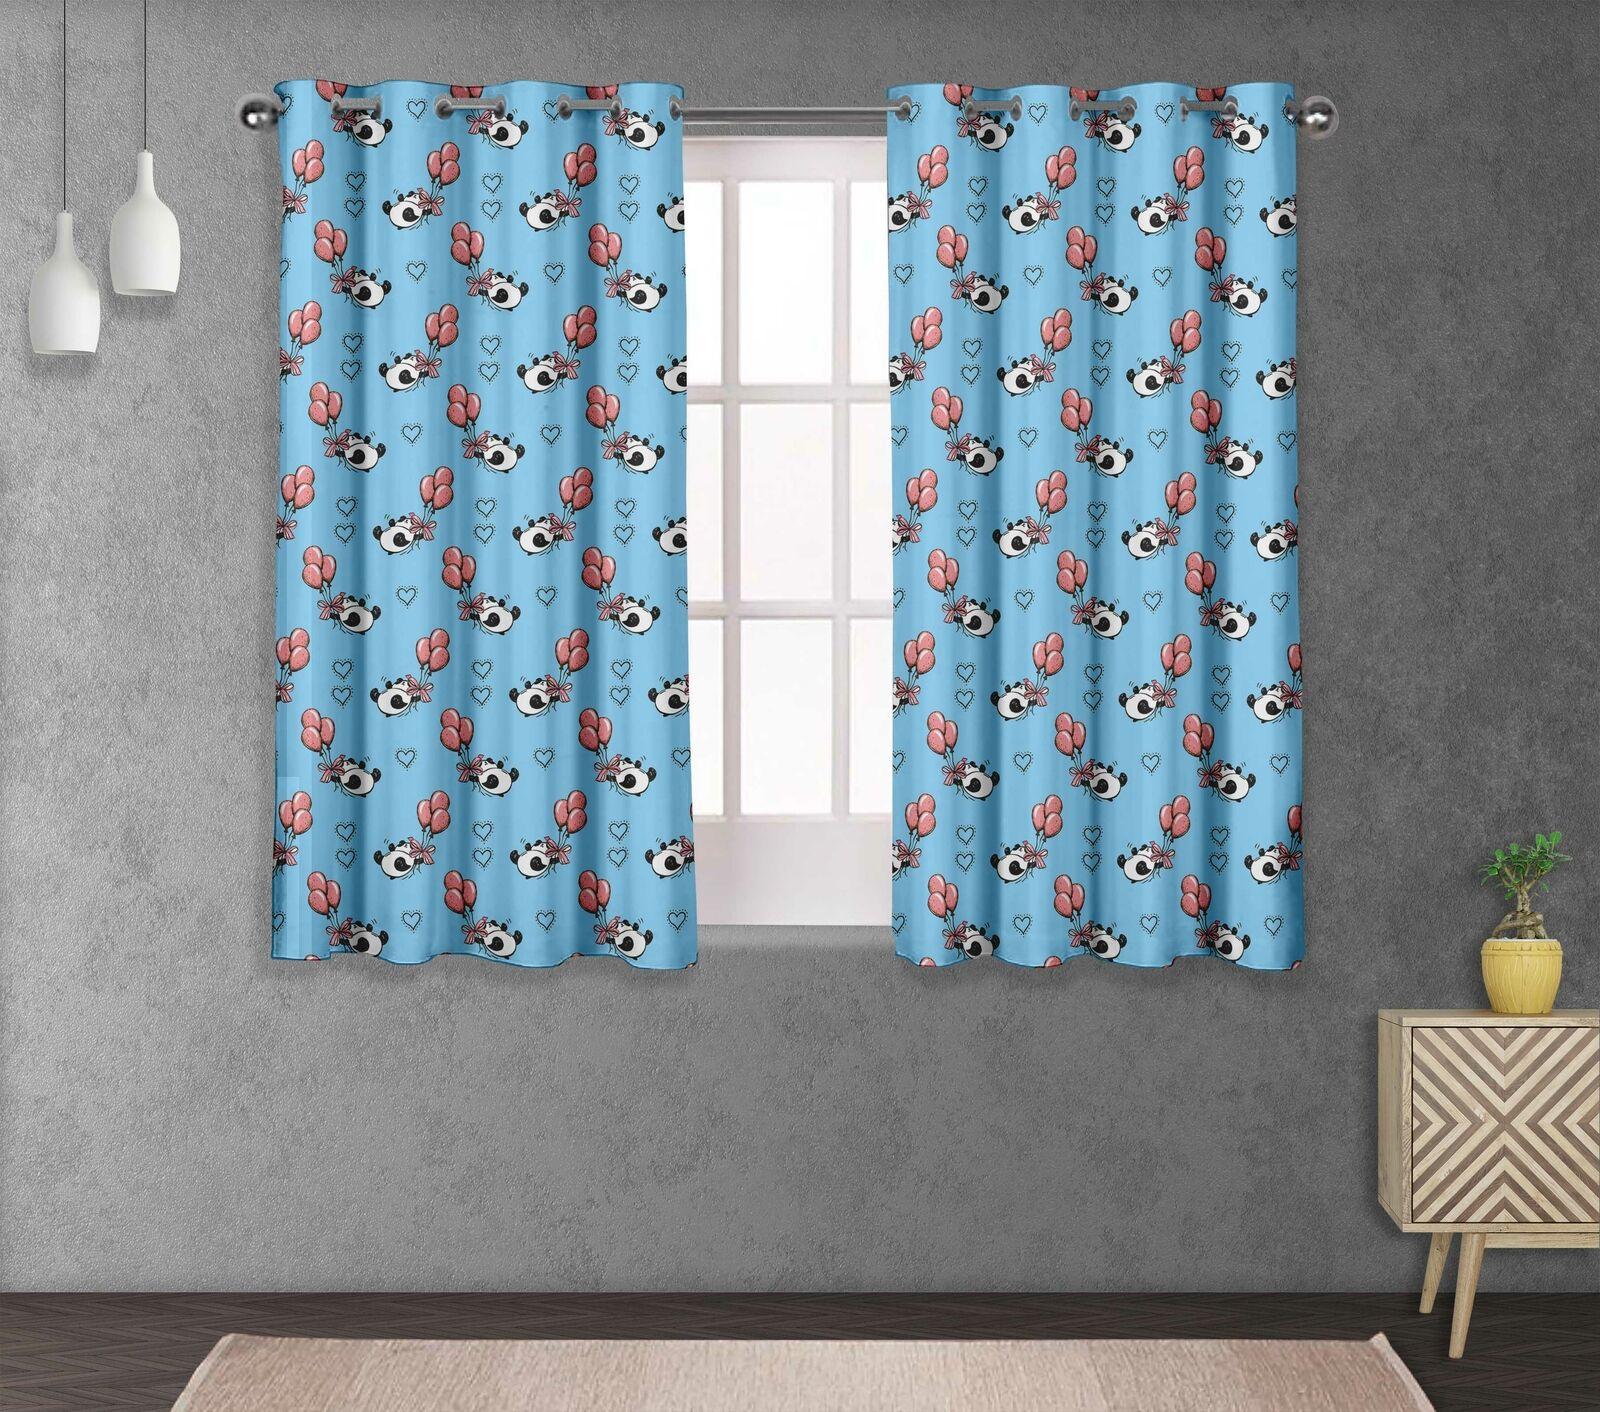 S 4 Sassy Panda & Globos Salón Ojal cortina de ventana de corto y larga-KD-512C